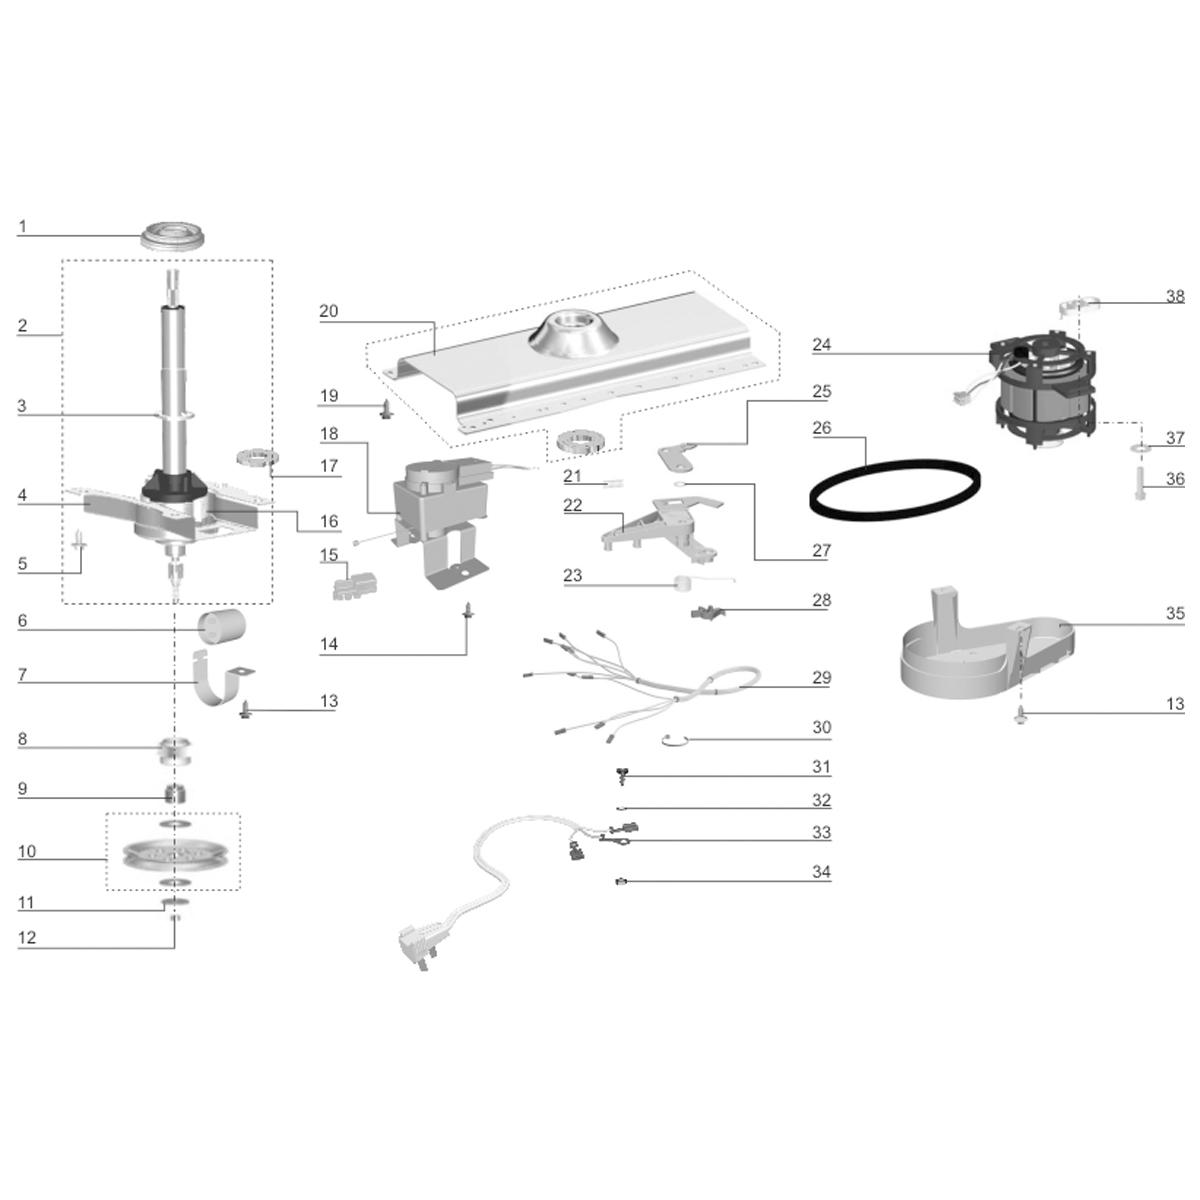 Braço Co-injetado Para Lavadora De Roupas Electrolux EW22 TOP8 LM08 ETL22 - 60016900 / A99405101